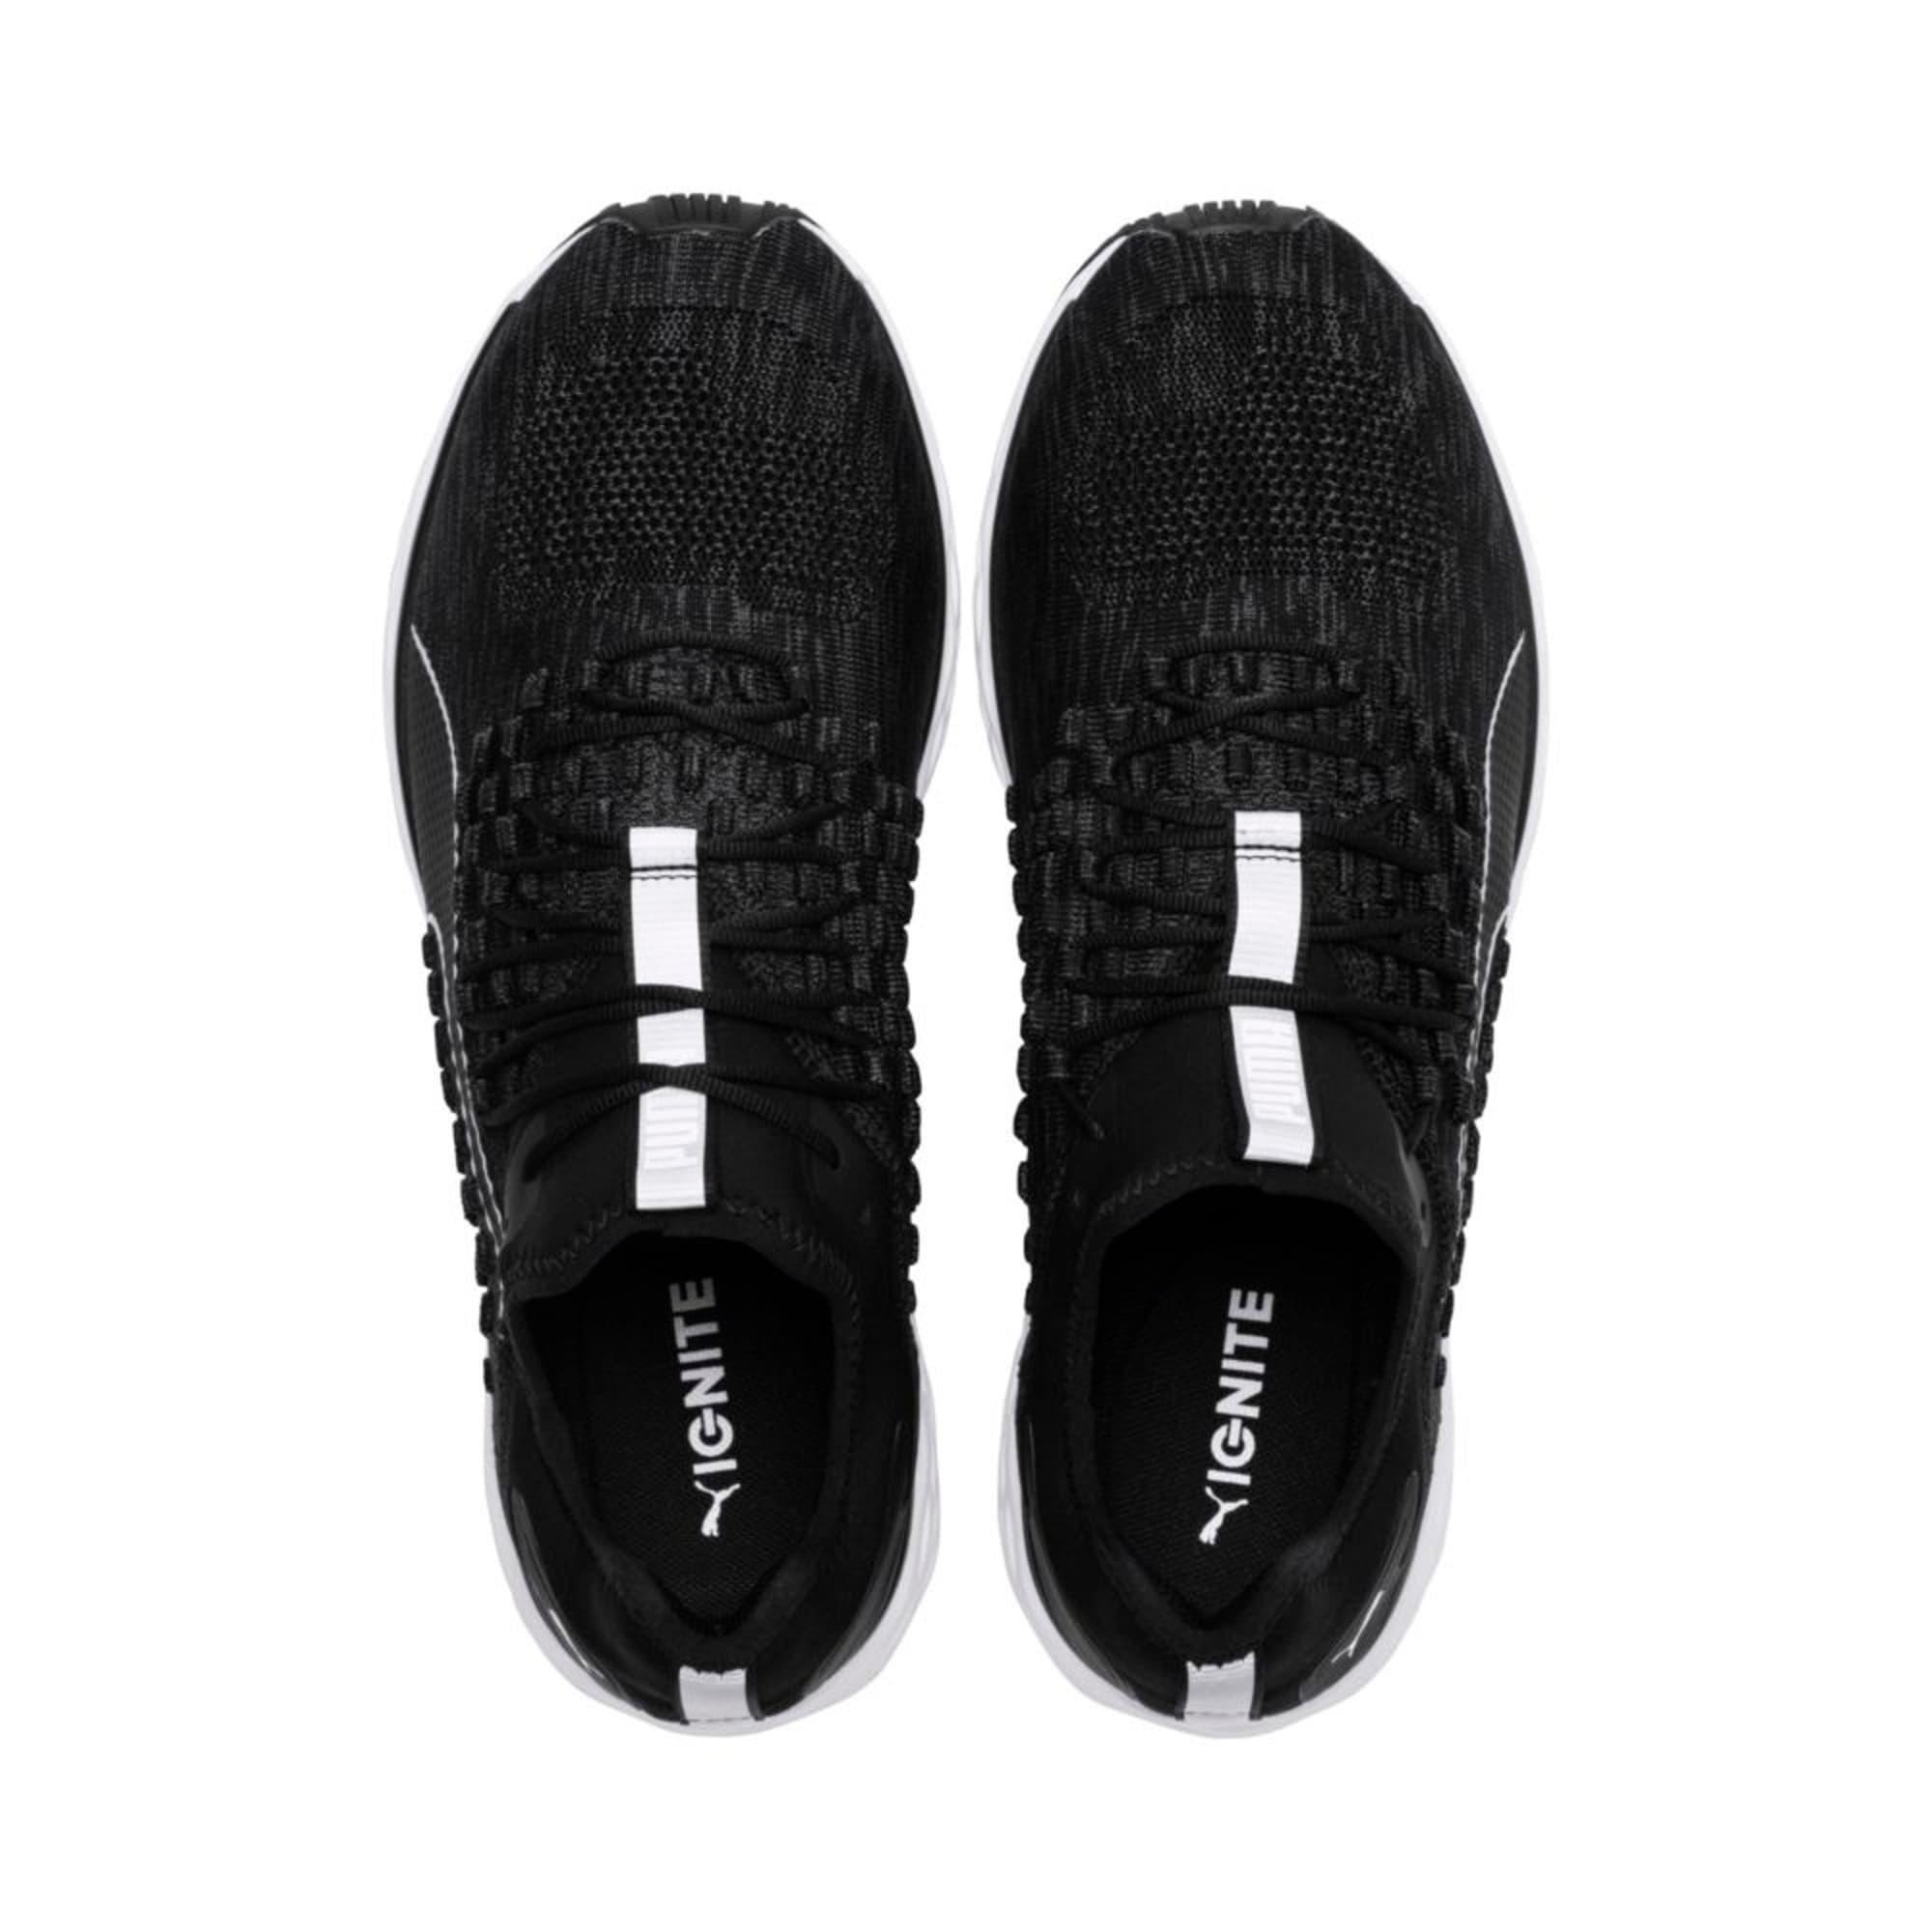 Thumbnail 4 of SPEED FUSEFIT Men's Running Shoes, Puma Black-Iron Gate, medium-IND